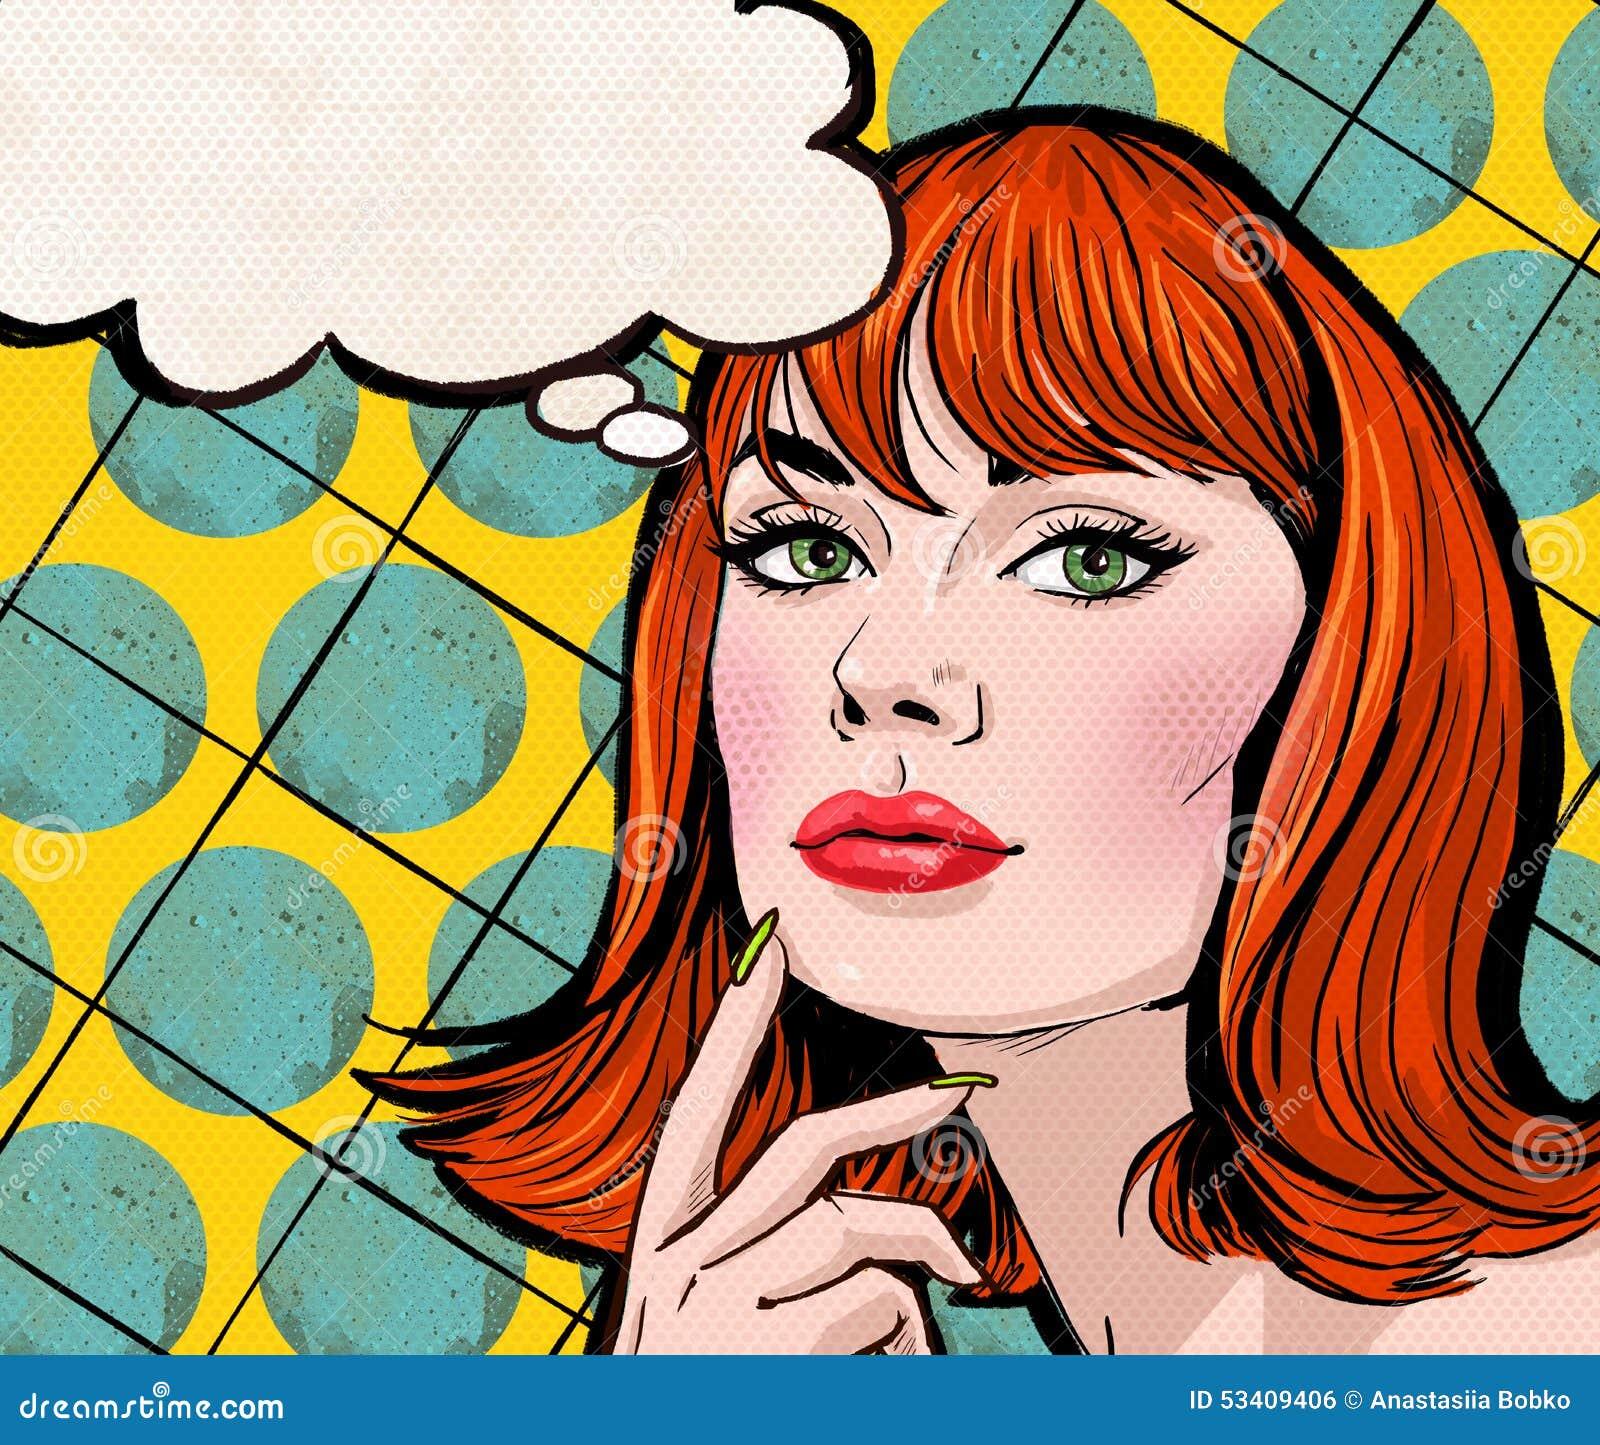 Art Illustration: Pop Art Illustration Of Girl With The Speech Bubble.Pop